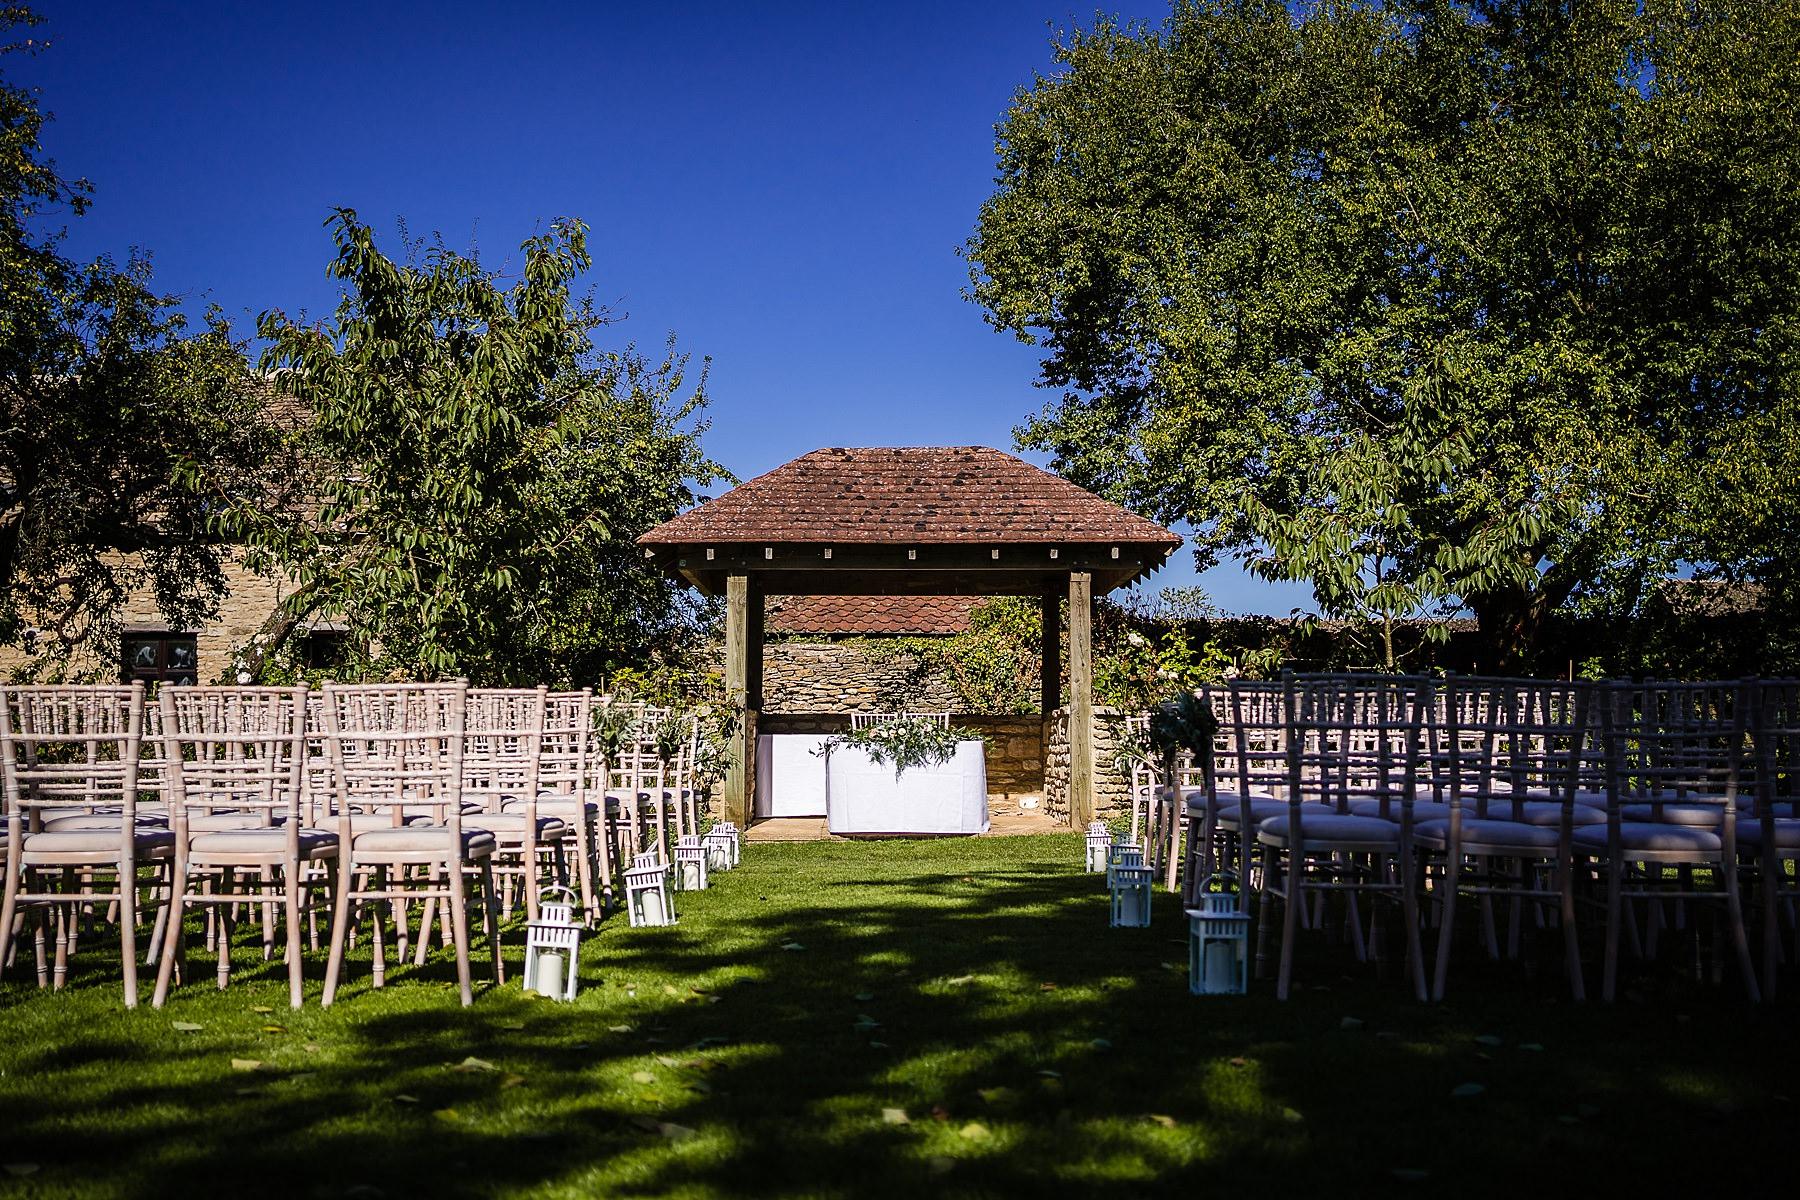 outdoor ceremony location